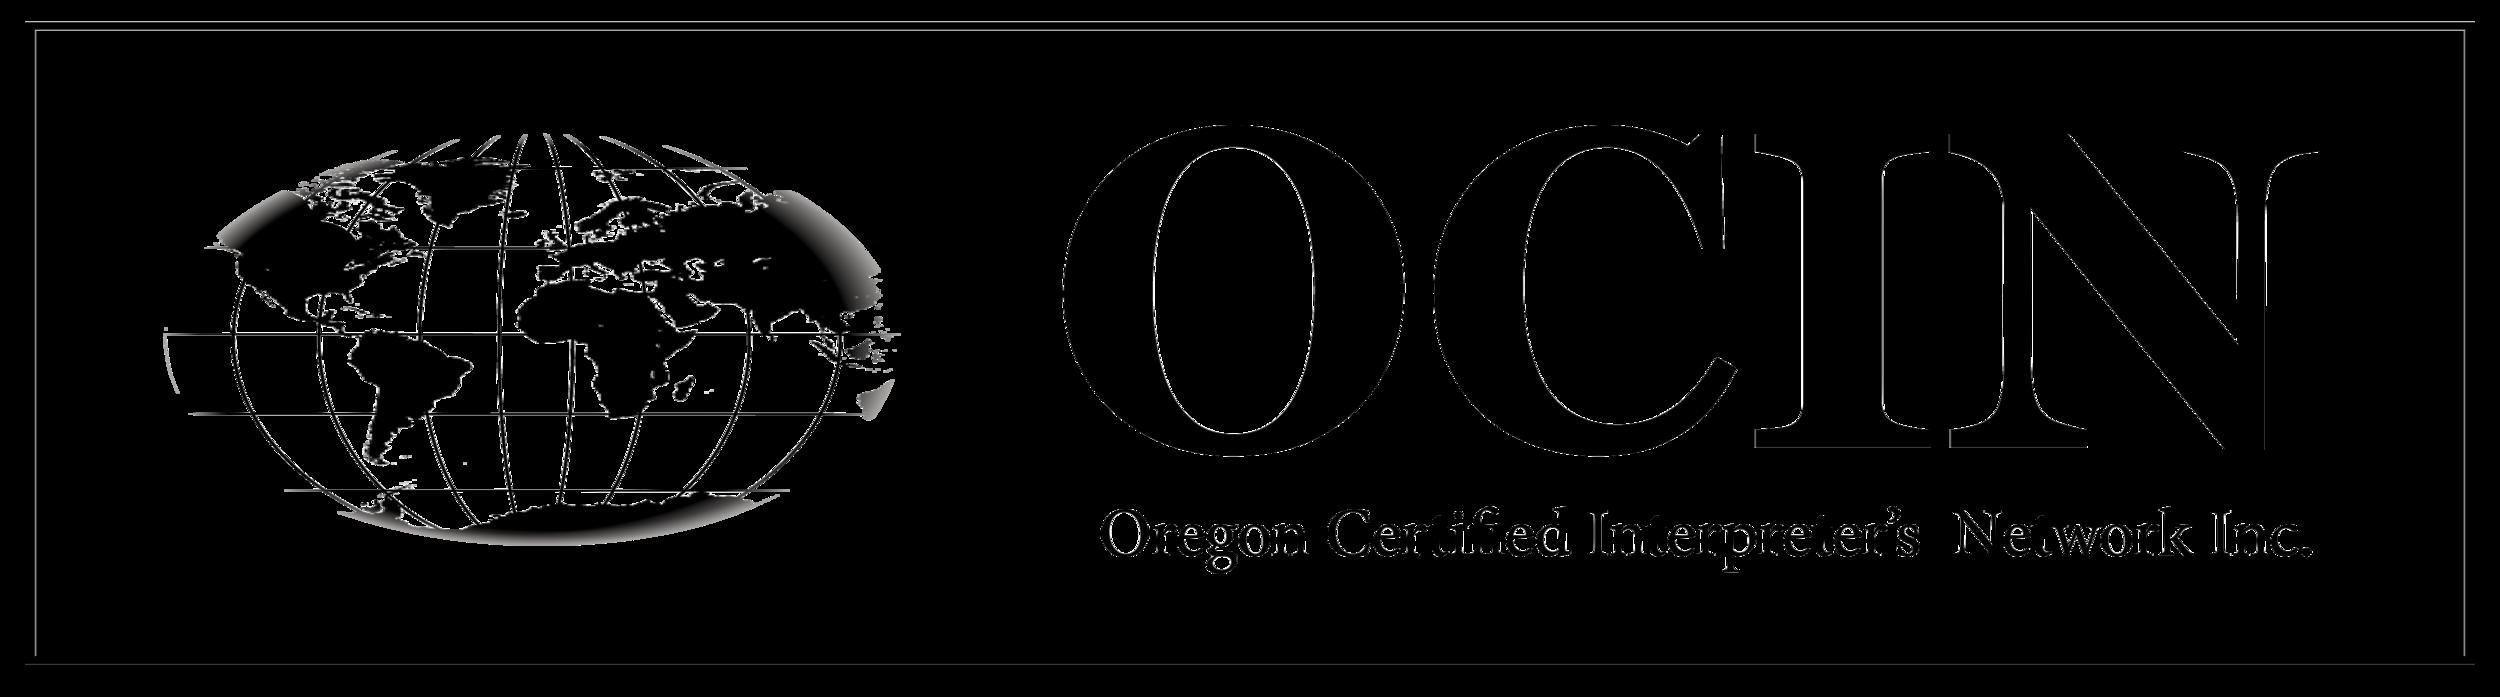 OCIN-Logo-Large-clear.png